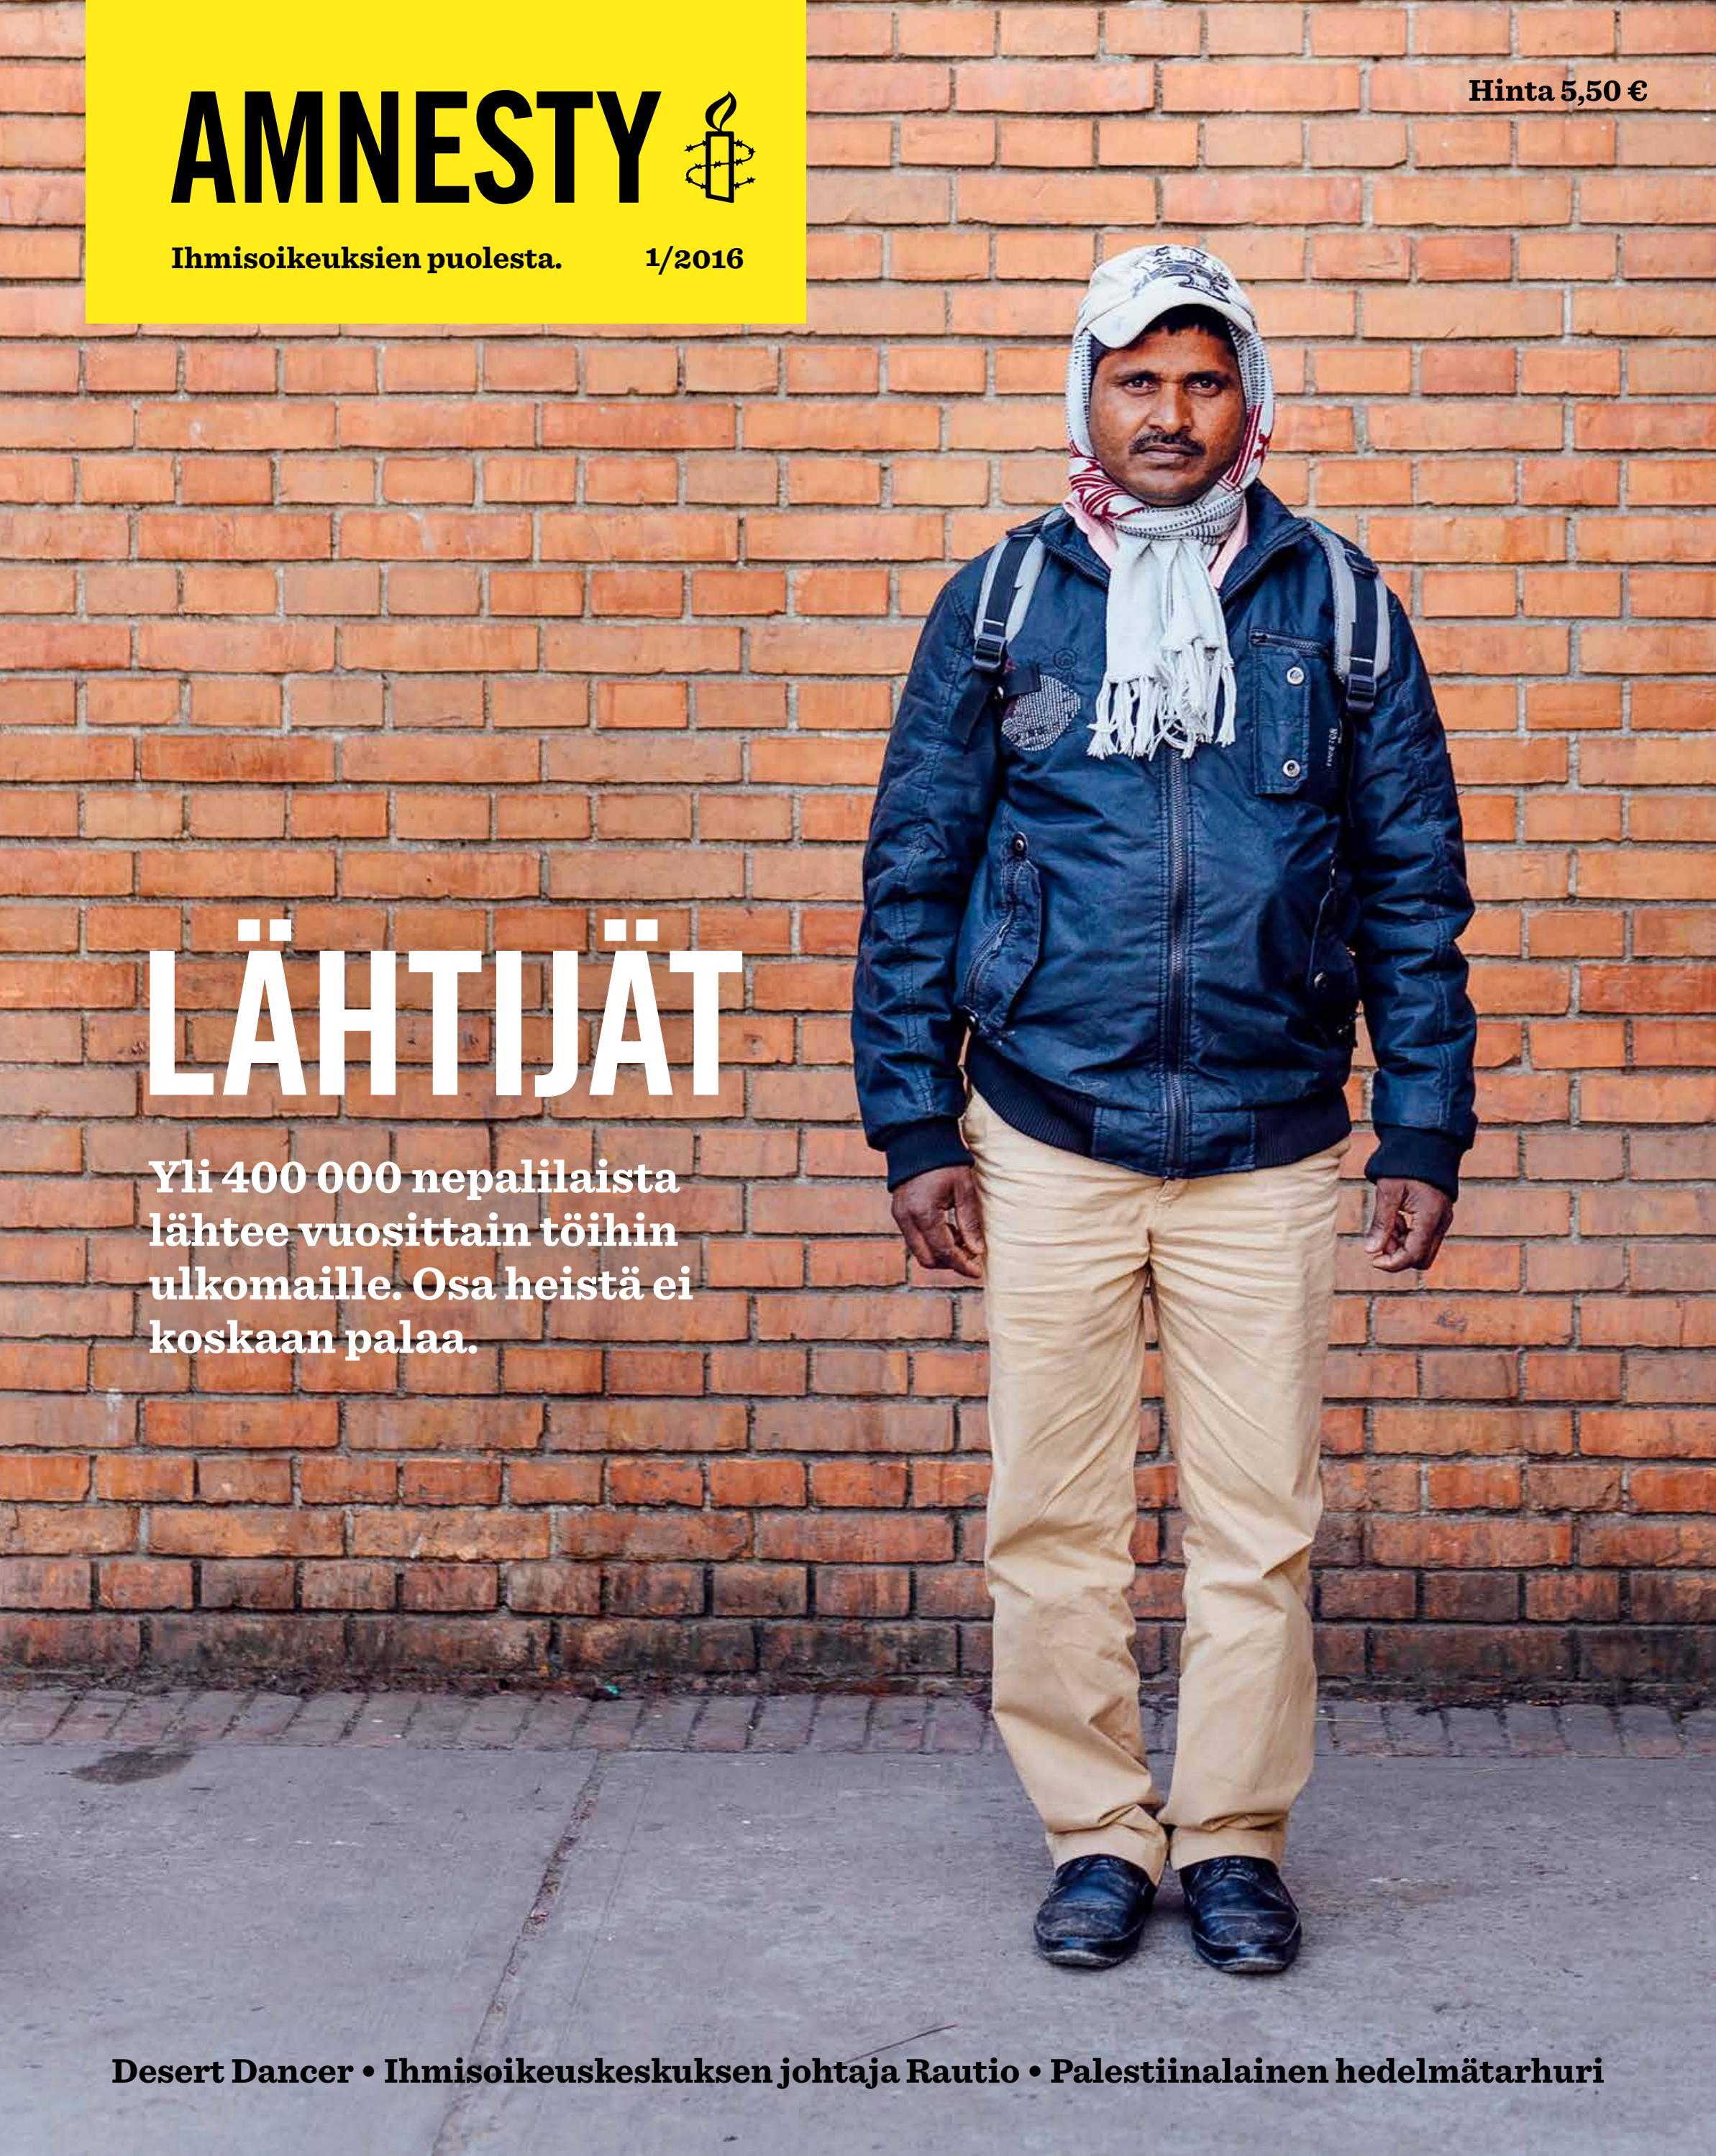 Amnesty suomi